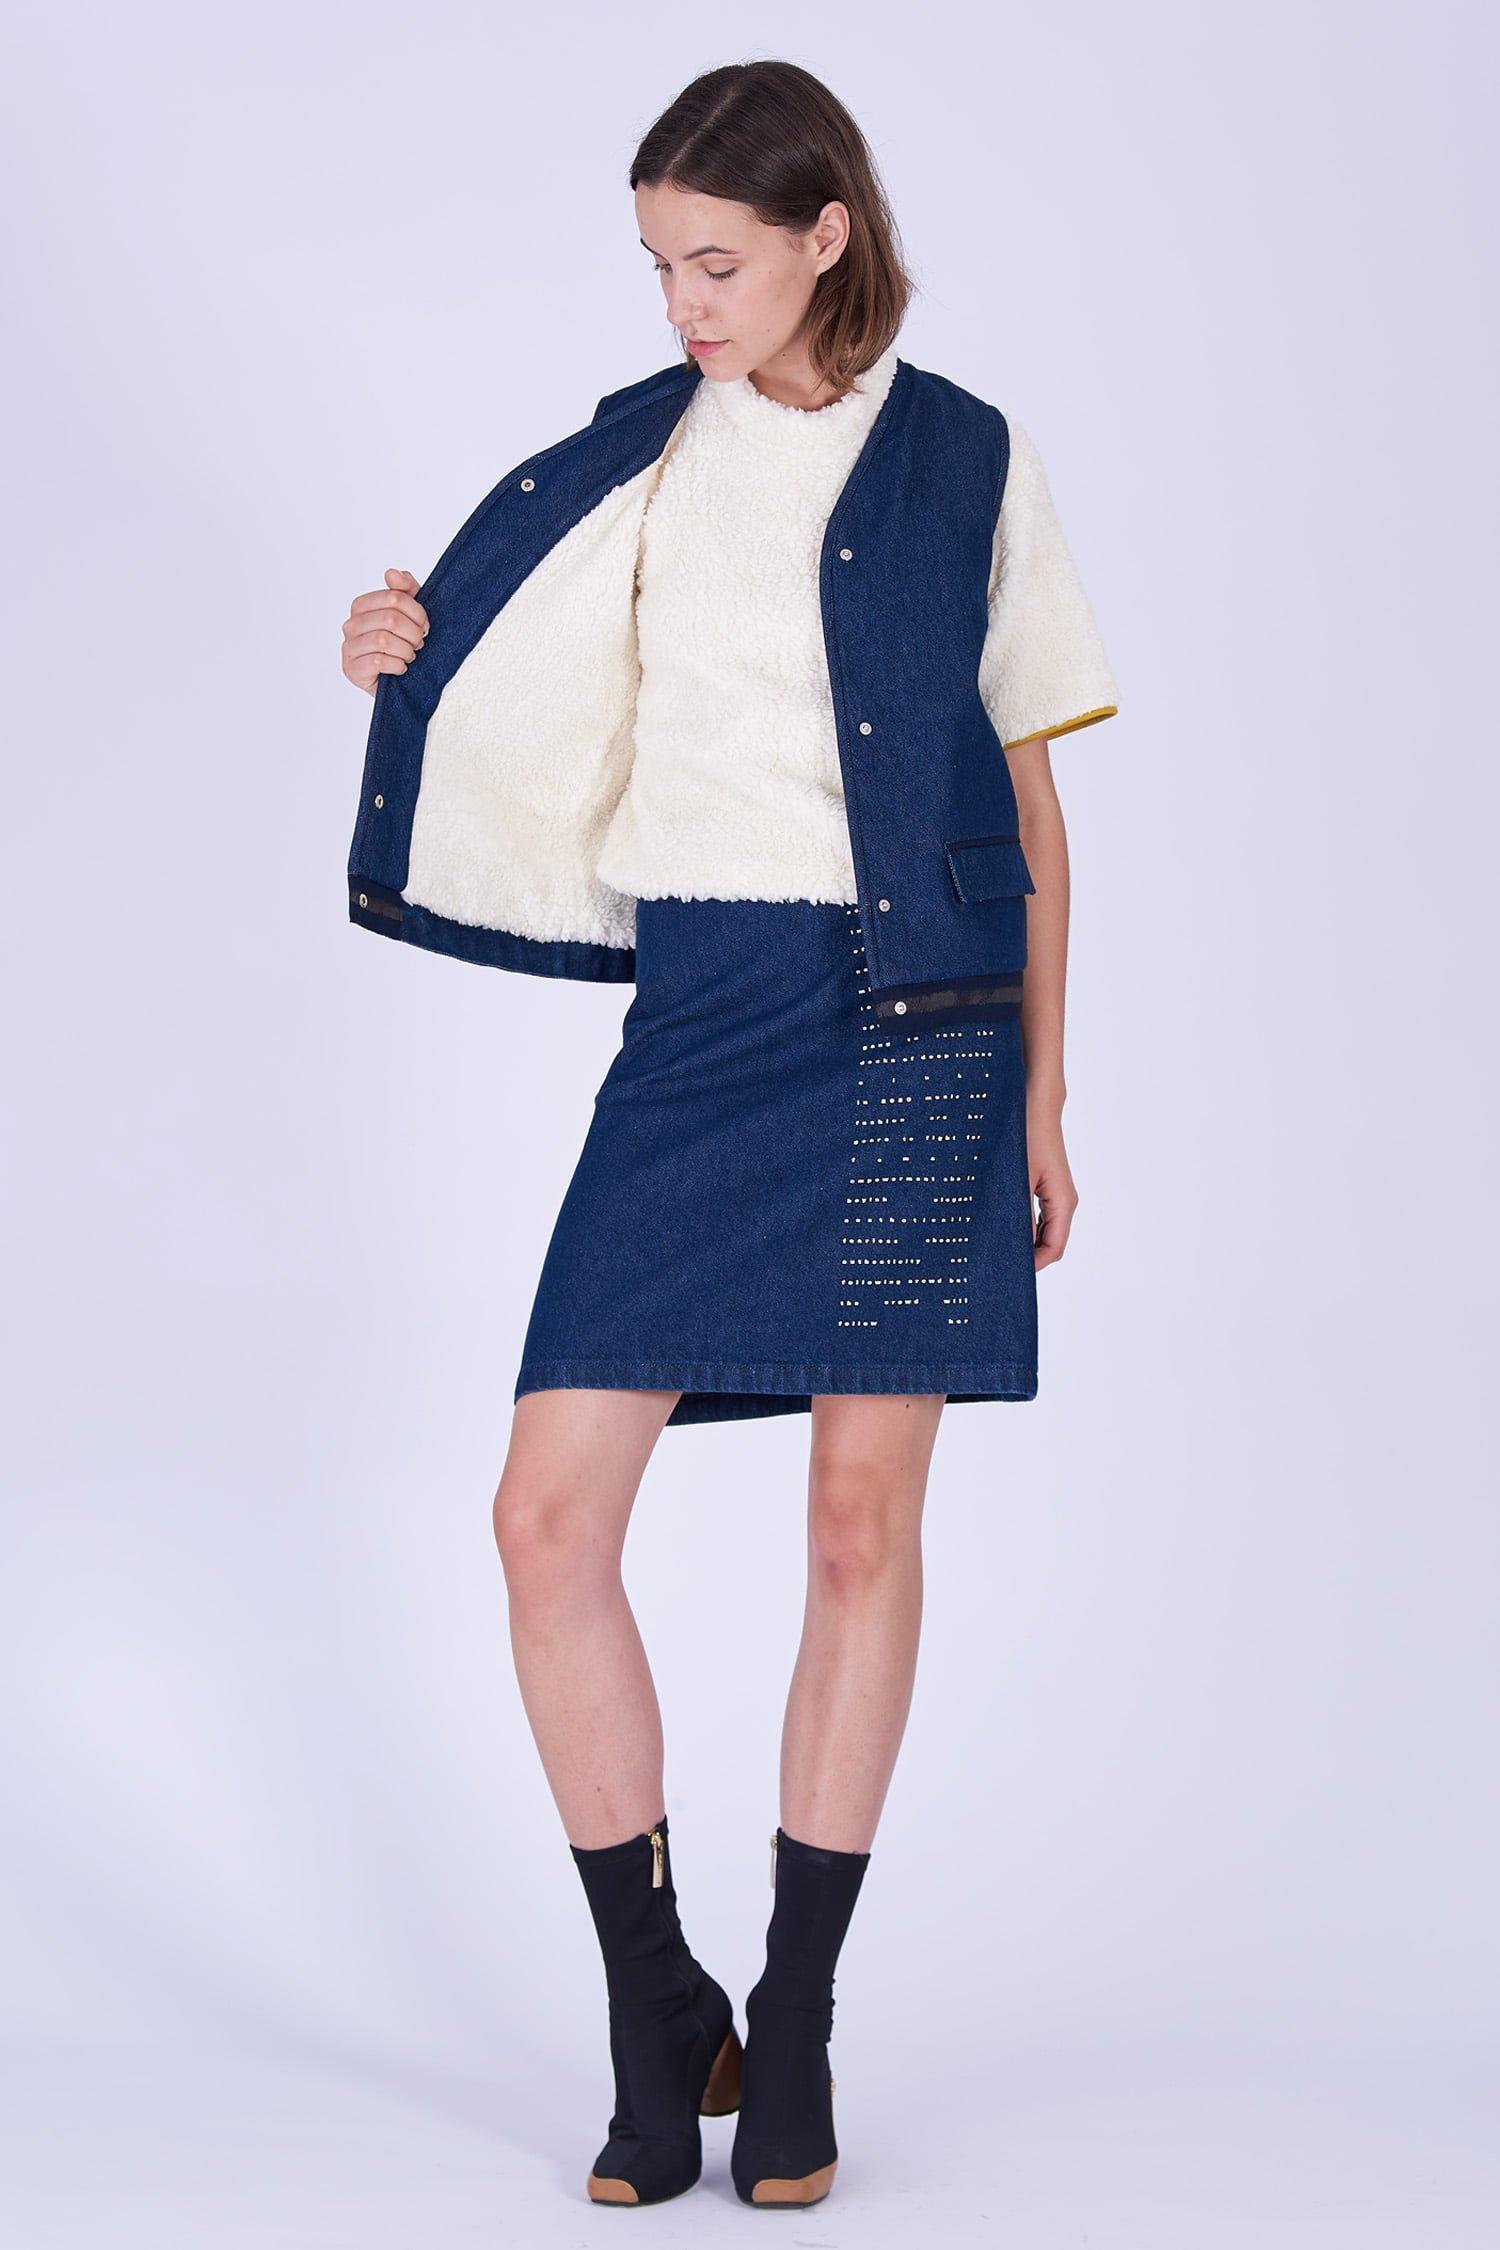 Acephala Fw19 20 Denim Vest Fleece Spodnica Denim Print Kamizelka Jeans Baranek Spodnica Jeans Nadruk Front 2